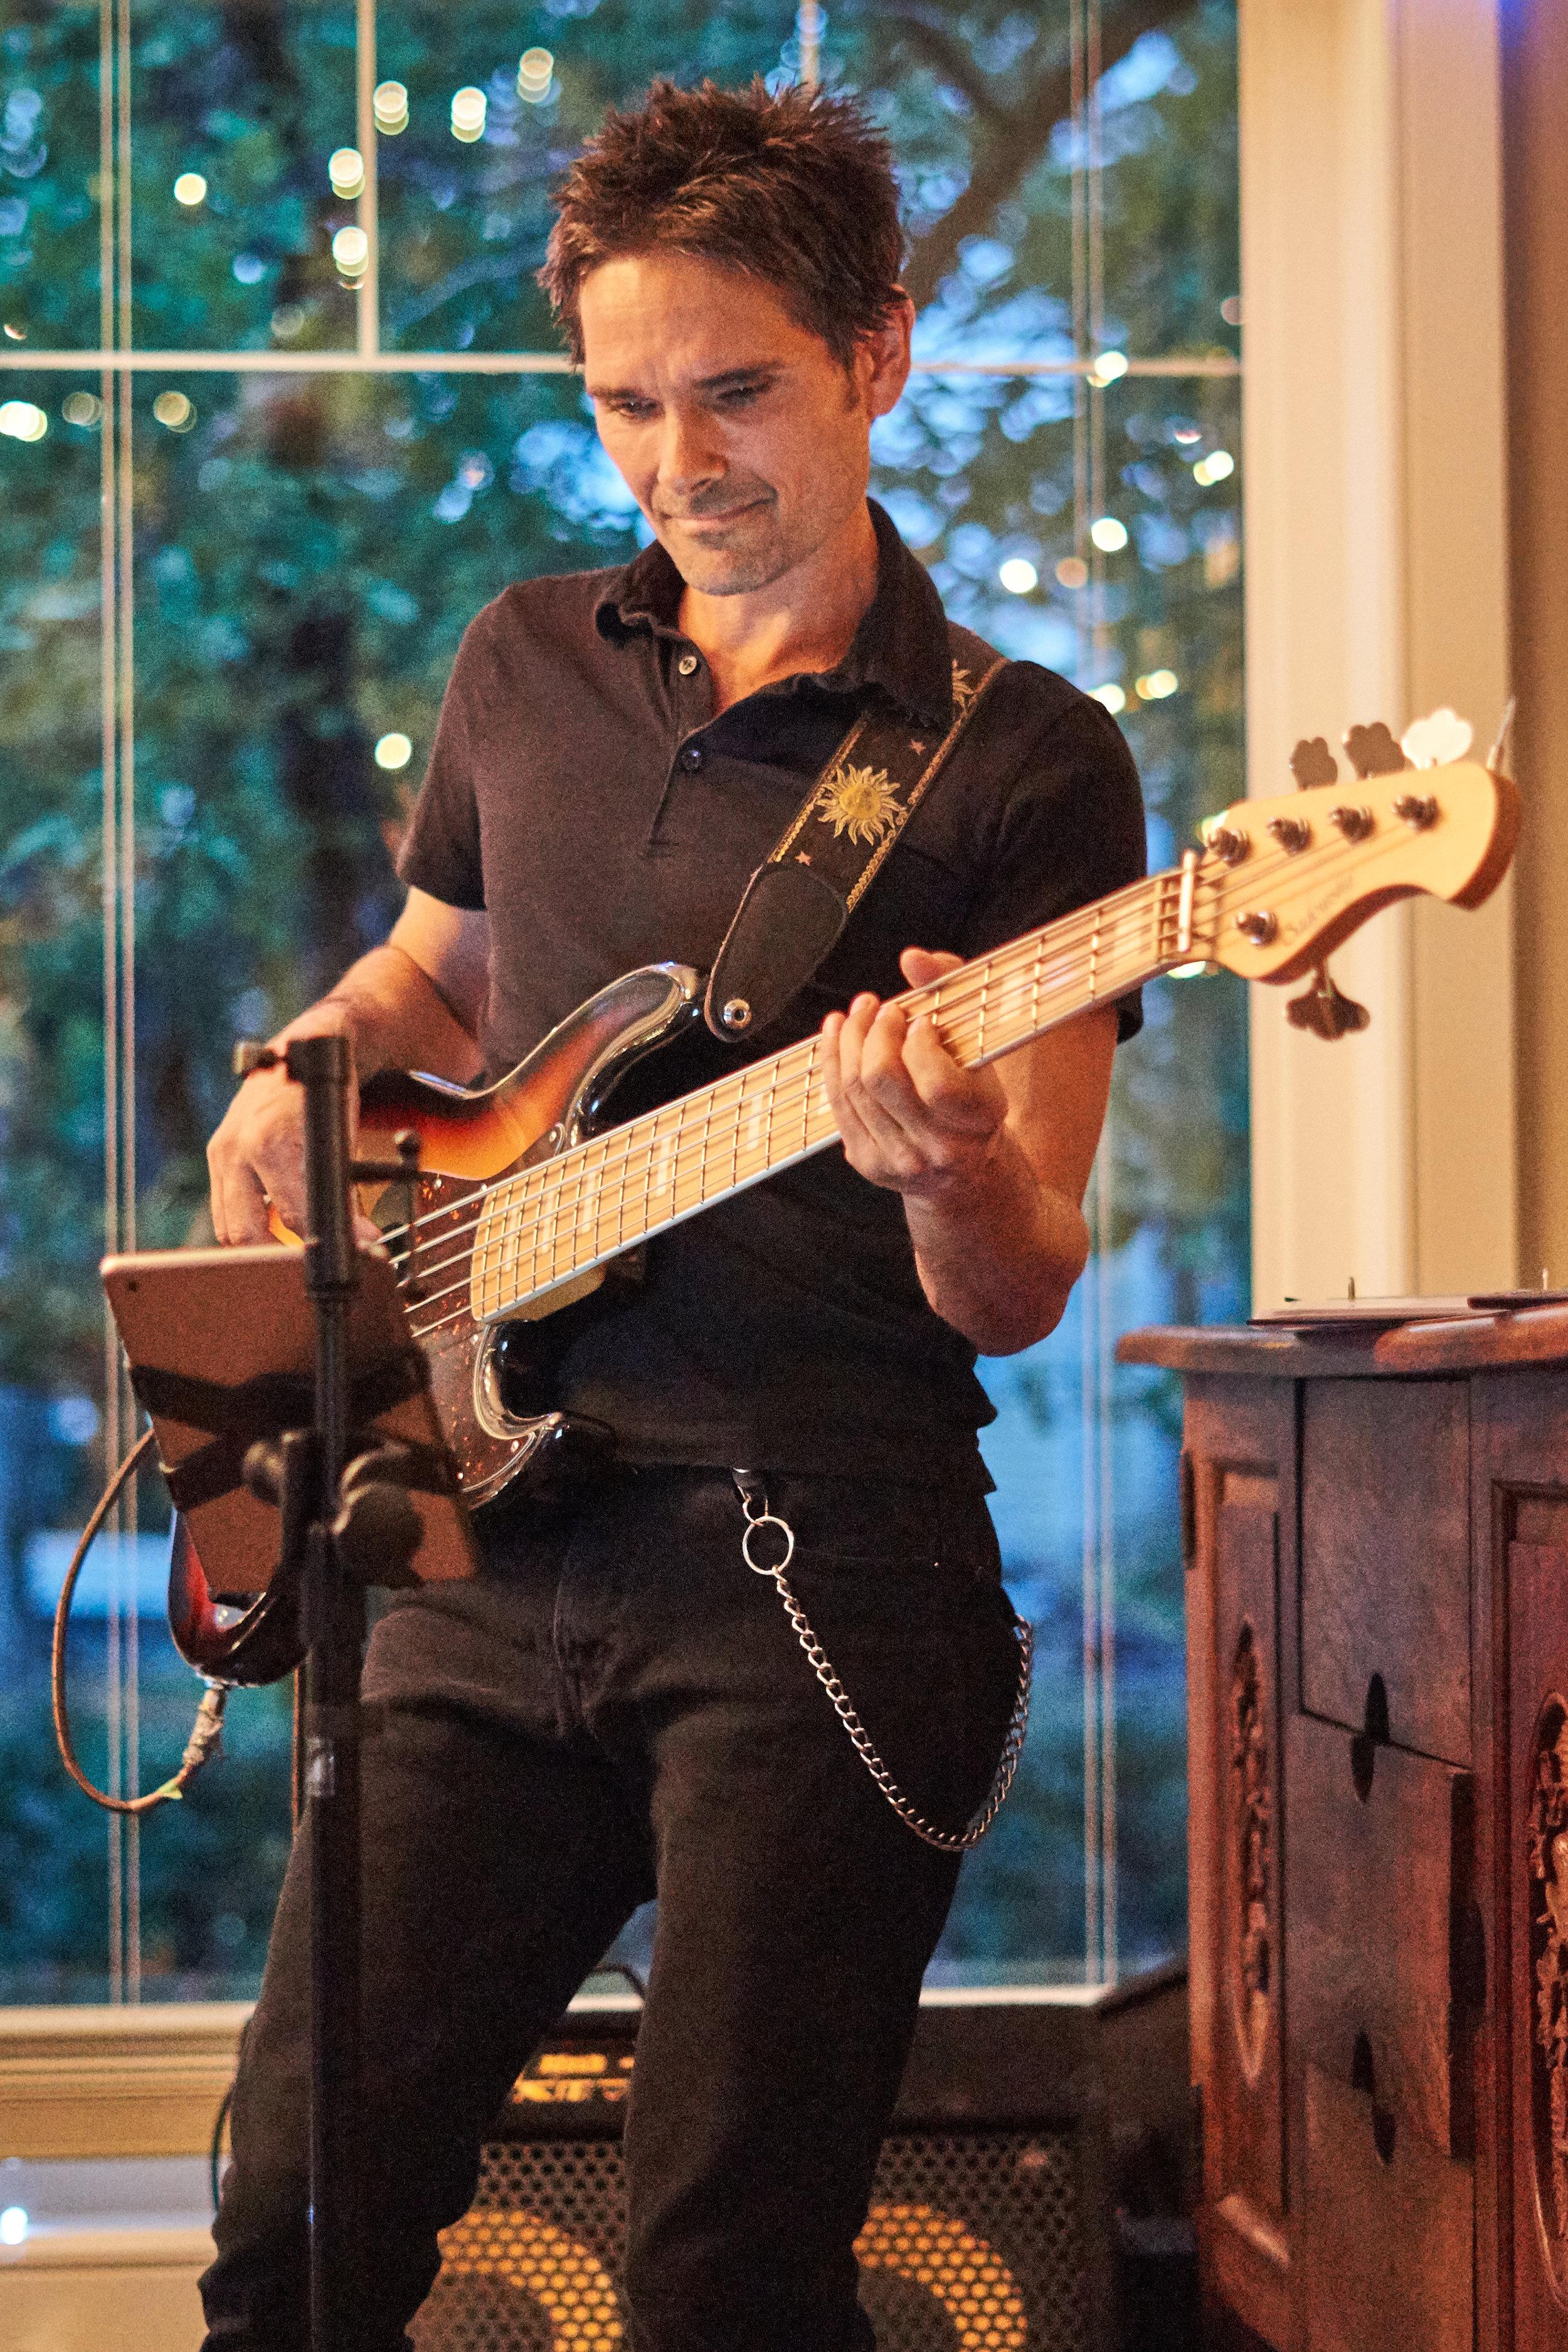 Bassist Dustin Roy